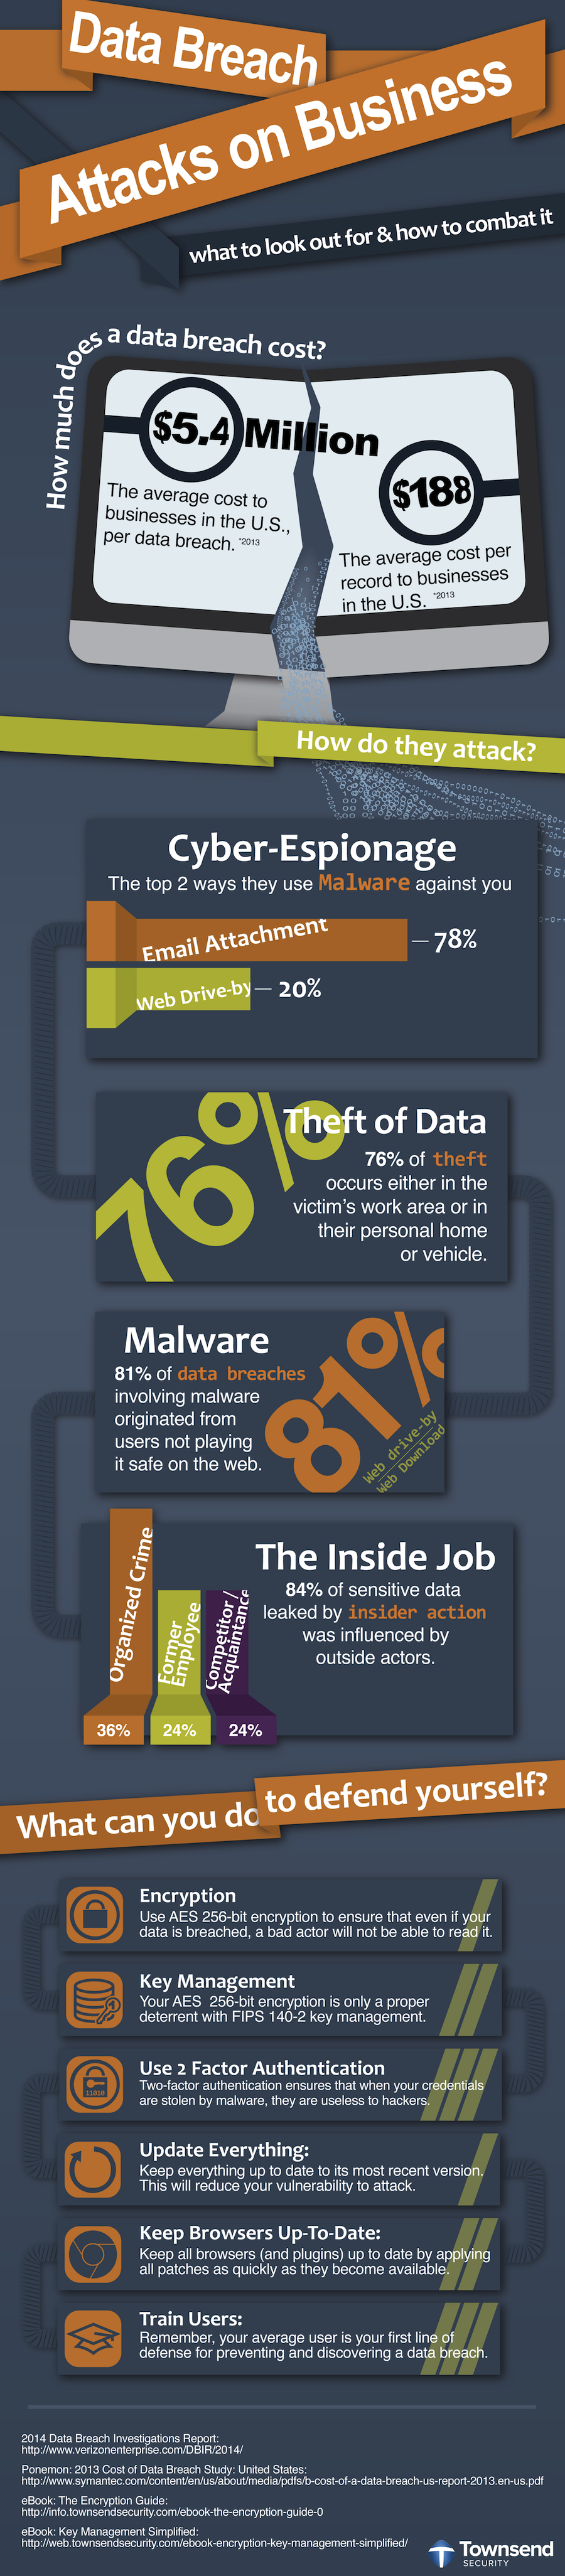 Data Breach Infographic